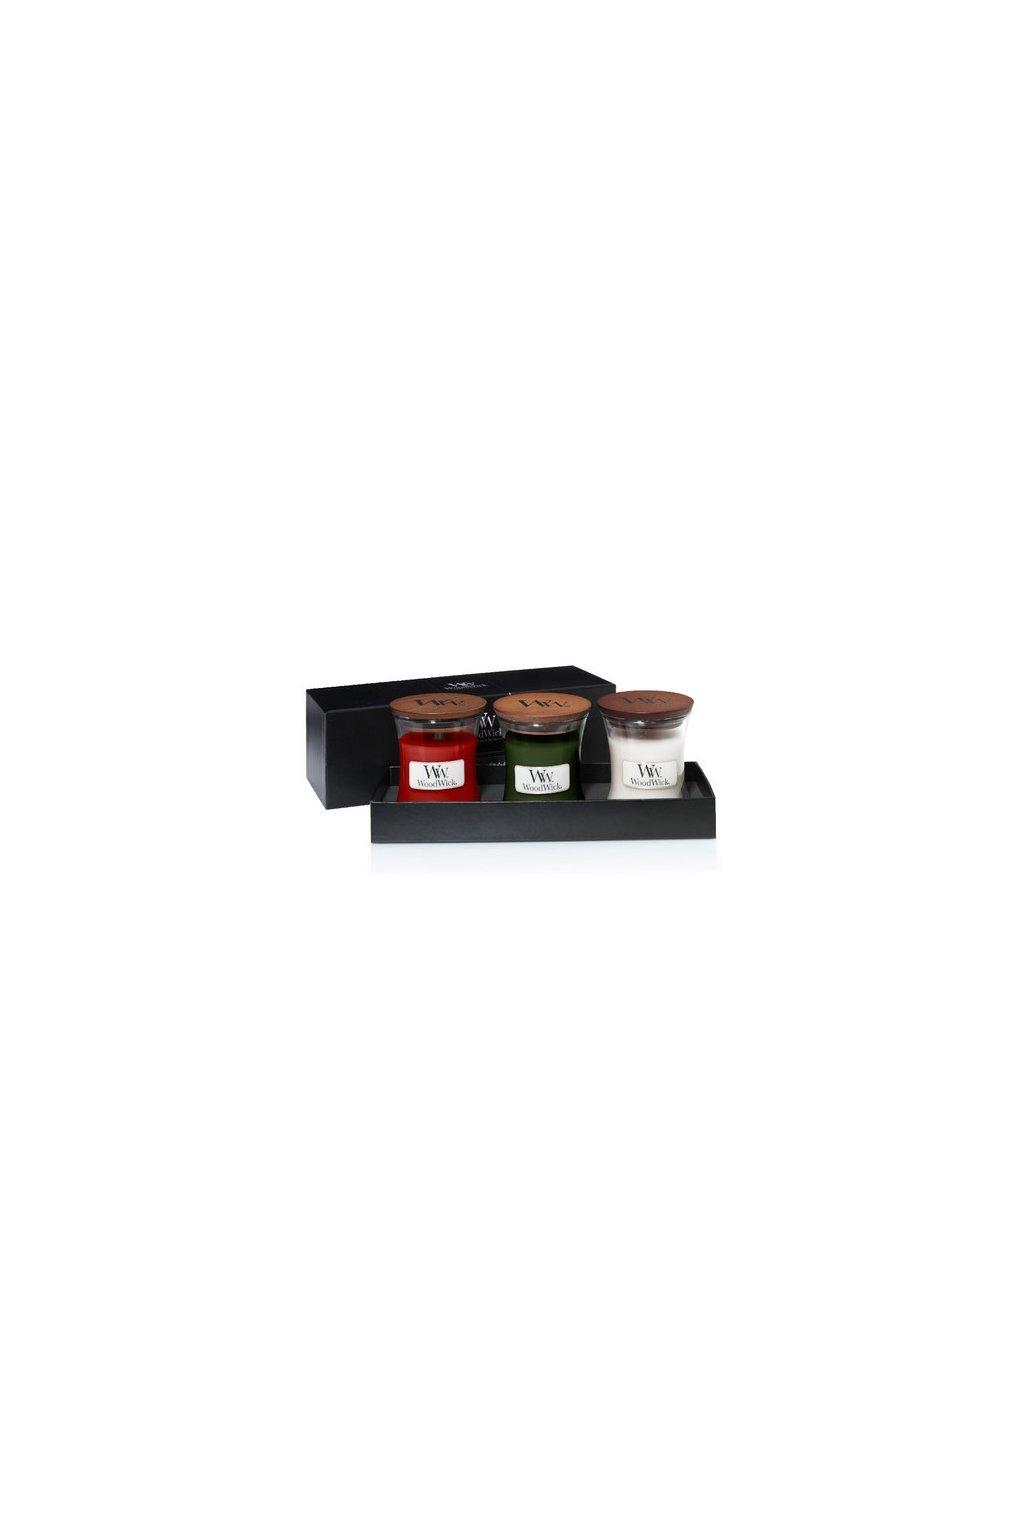 WoodWick dárkový set Frasier Fir,White Teak, Crimson Berries váza malá 3 ks